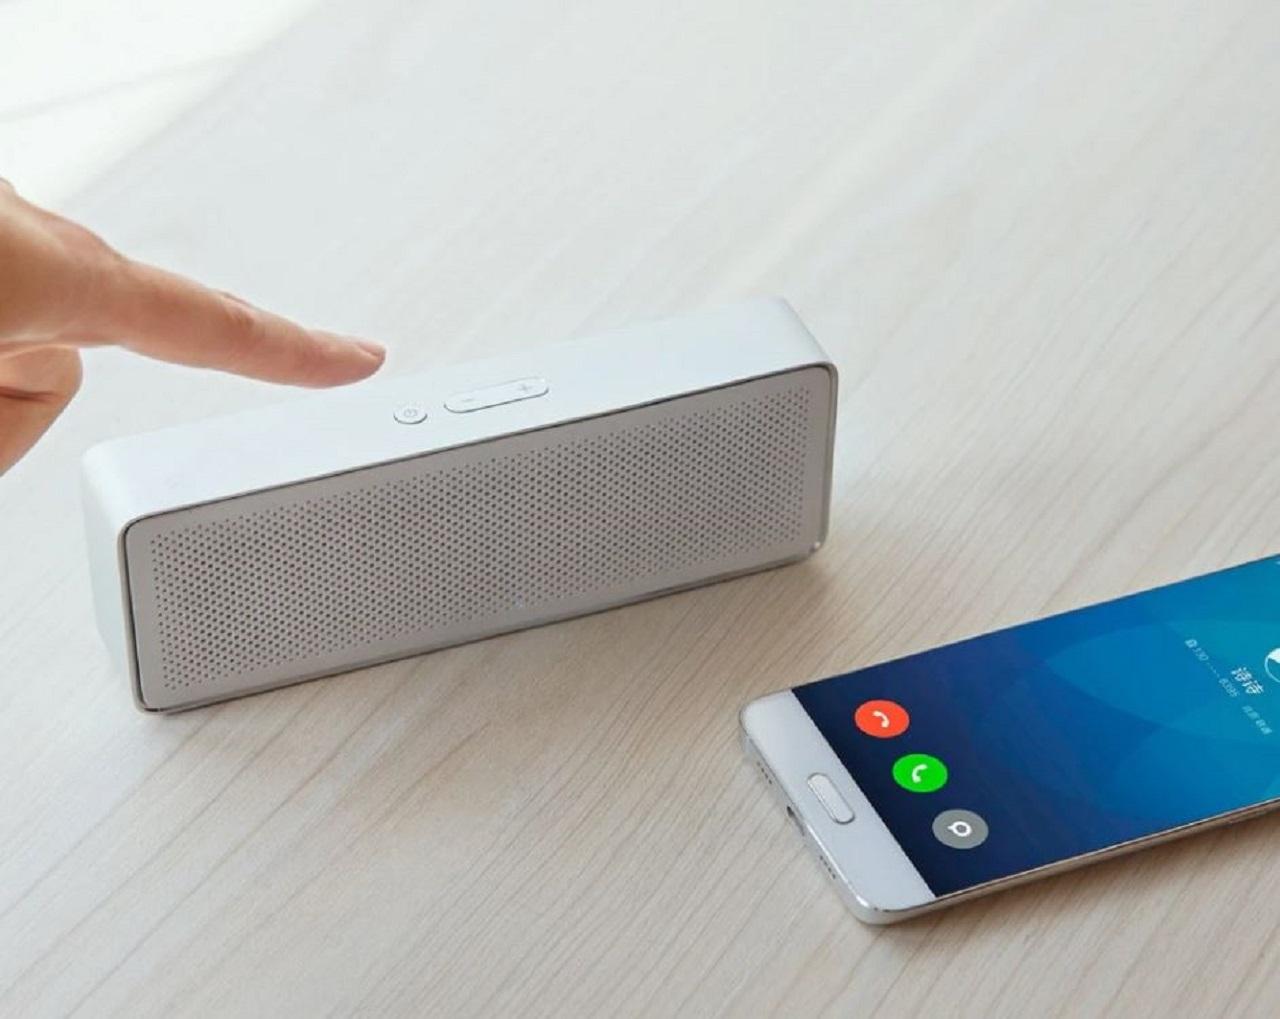 Xiaomi MI BT Speaker: skvělý bluetooth reproduktor se slevou 67 % v obchodě Cafago.com [sponzorovaný článek]